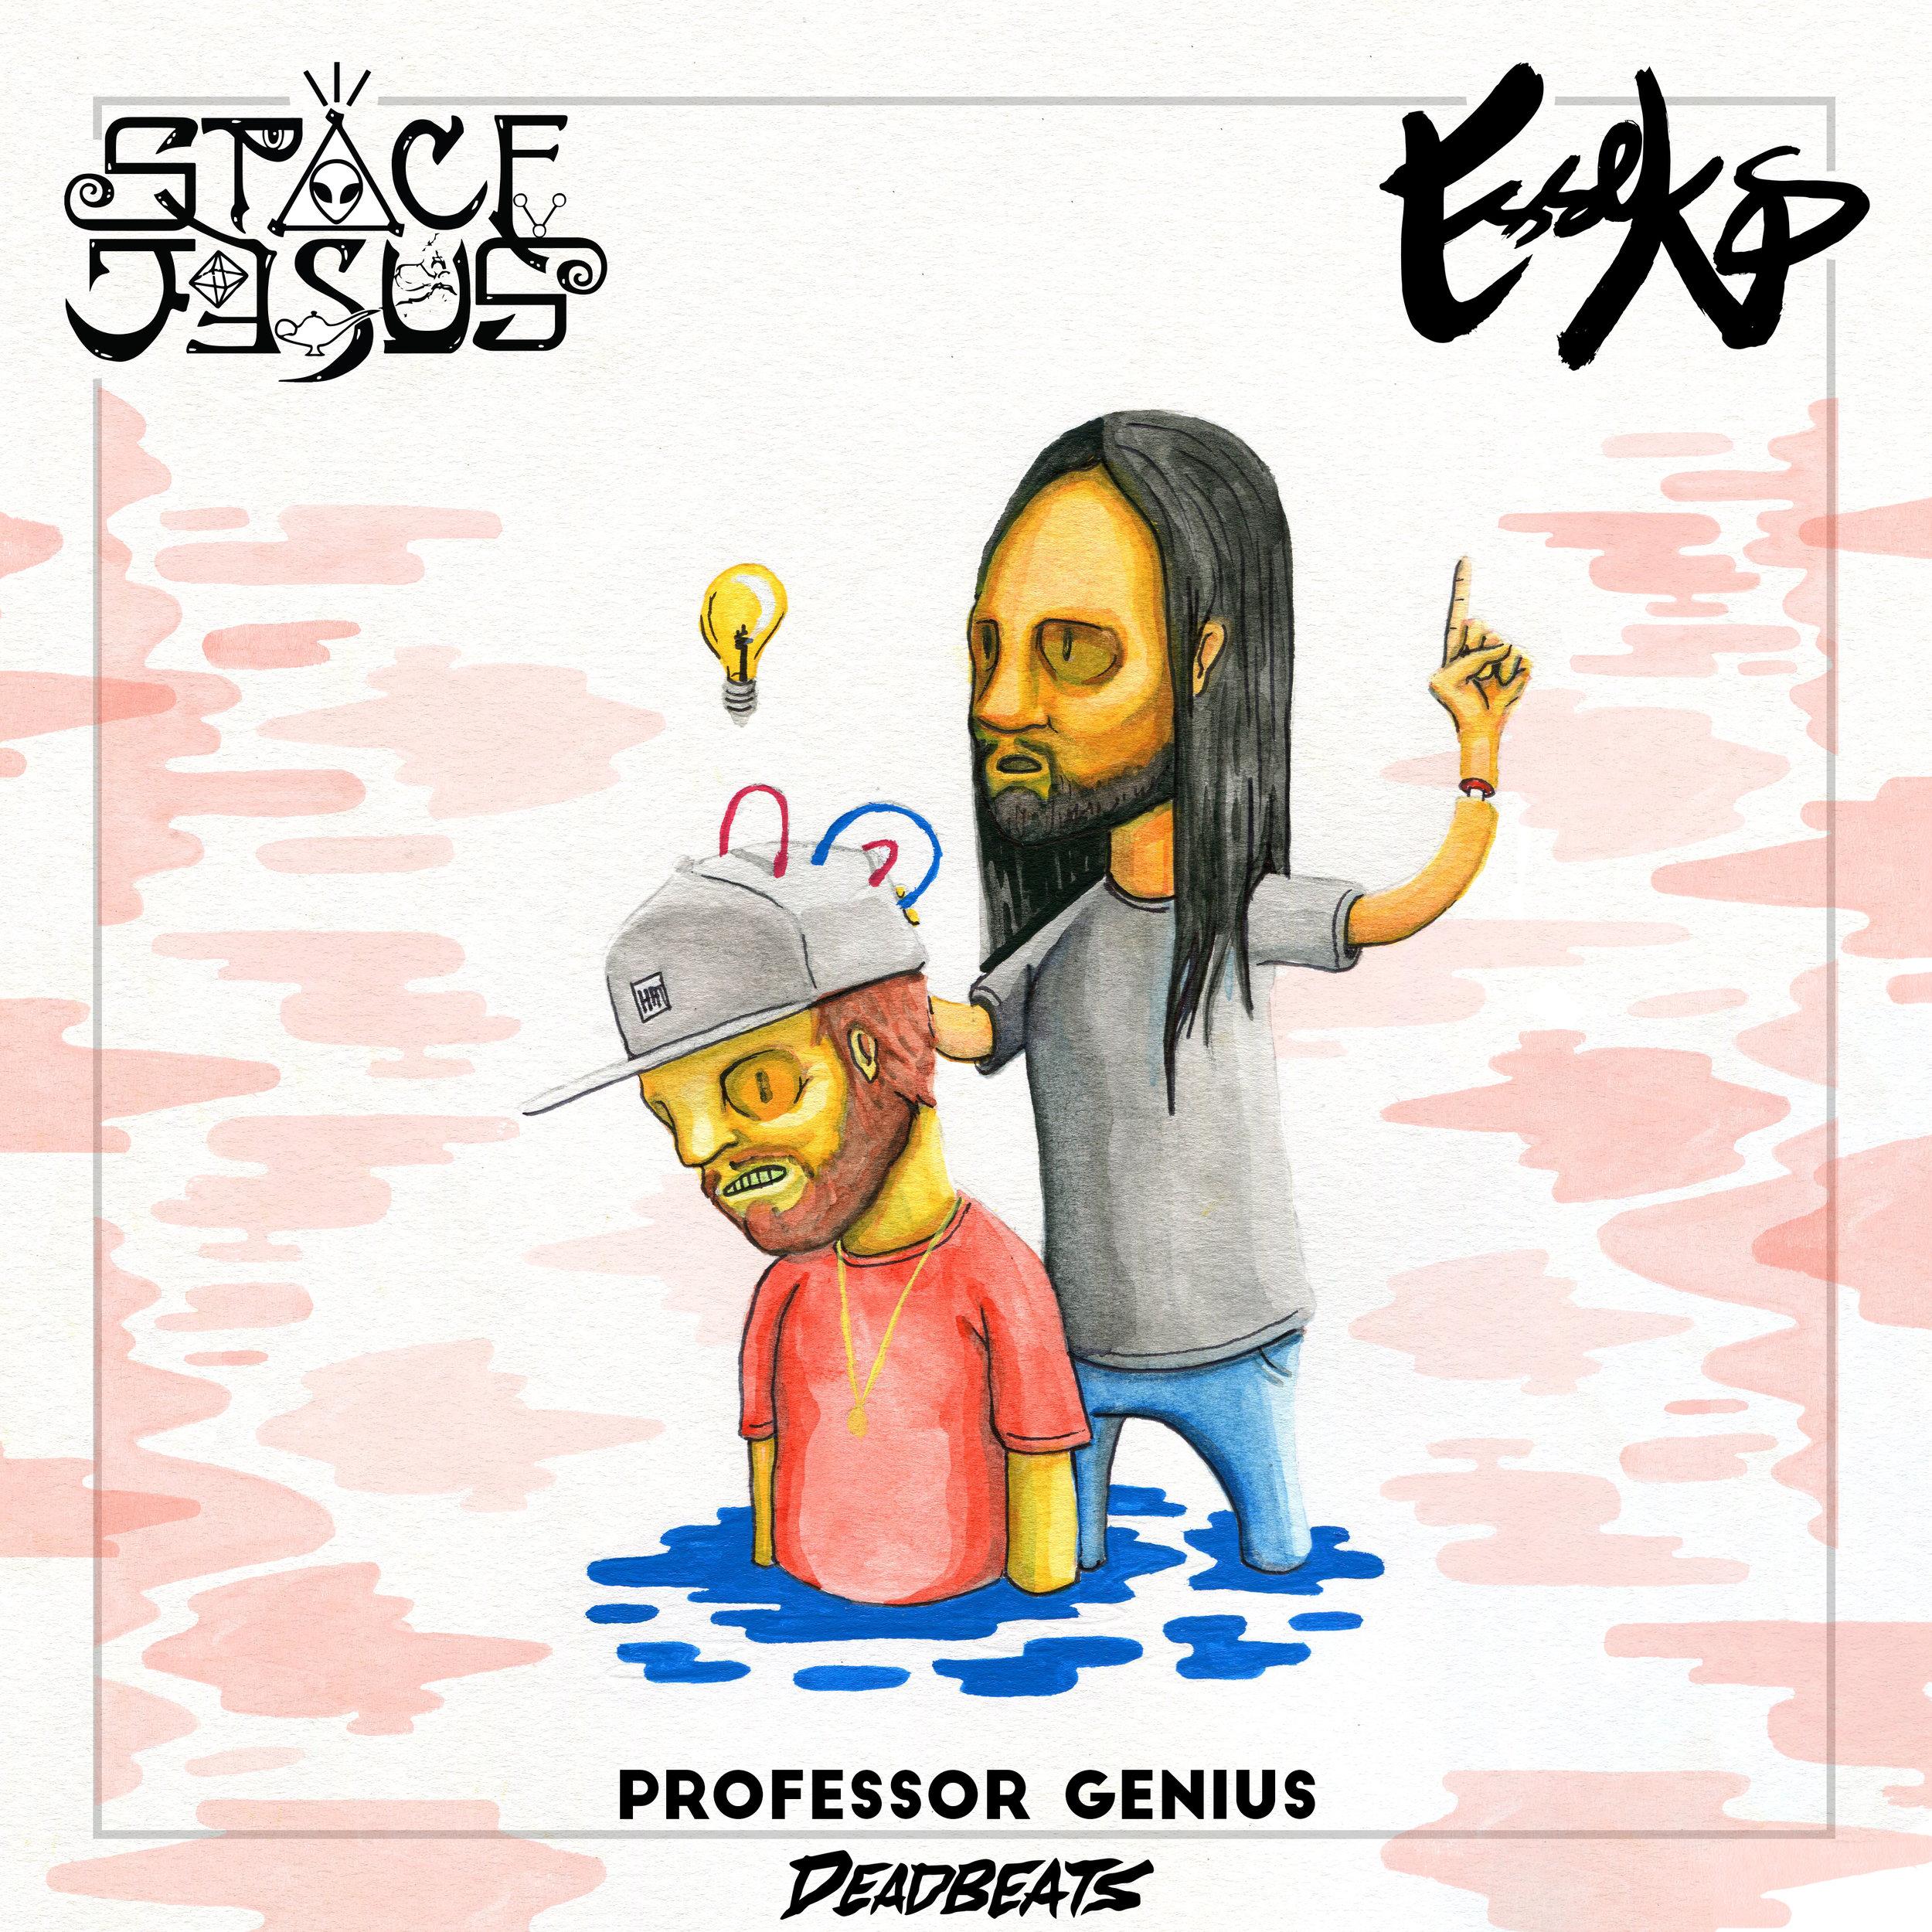 Space Jesus + Esseks - Professor Genius - ARTWORK.jpg